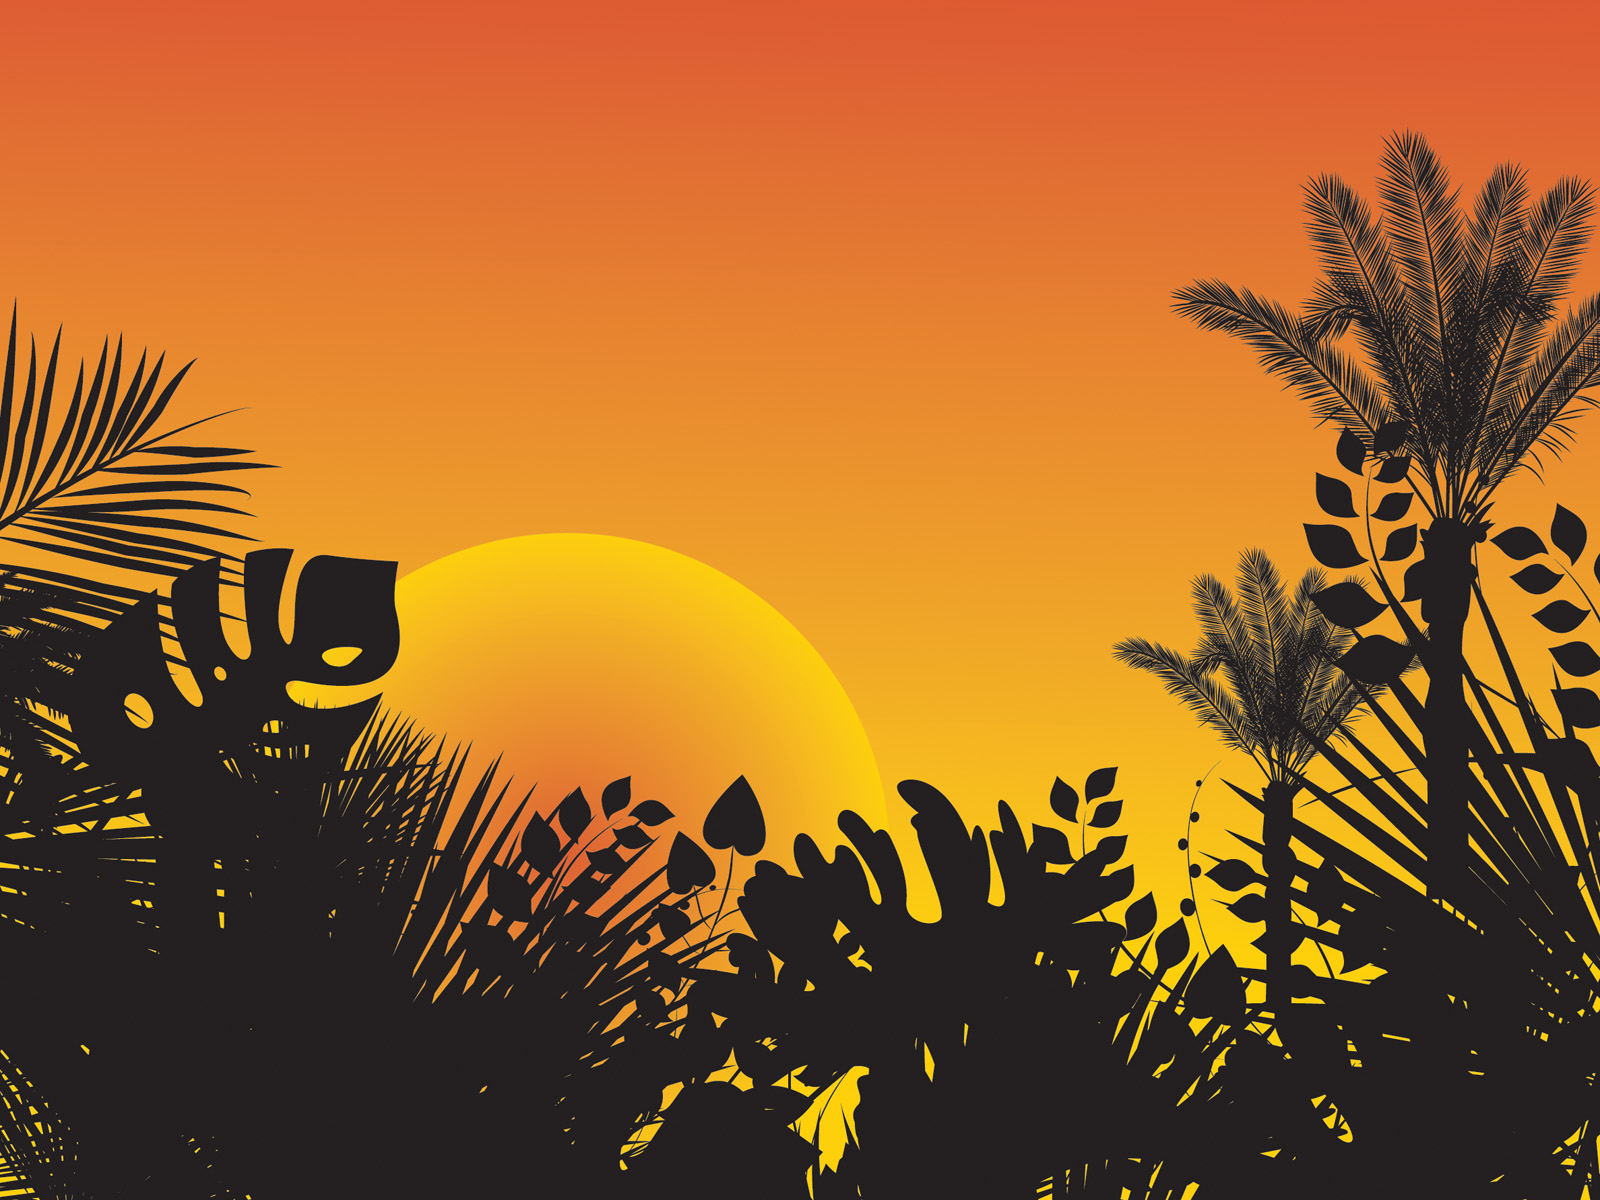 Tropical Sunset Design PPT Backgrounds - Design Templates